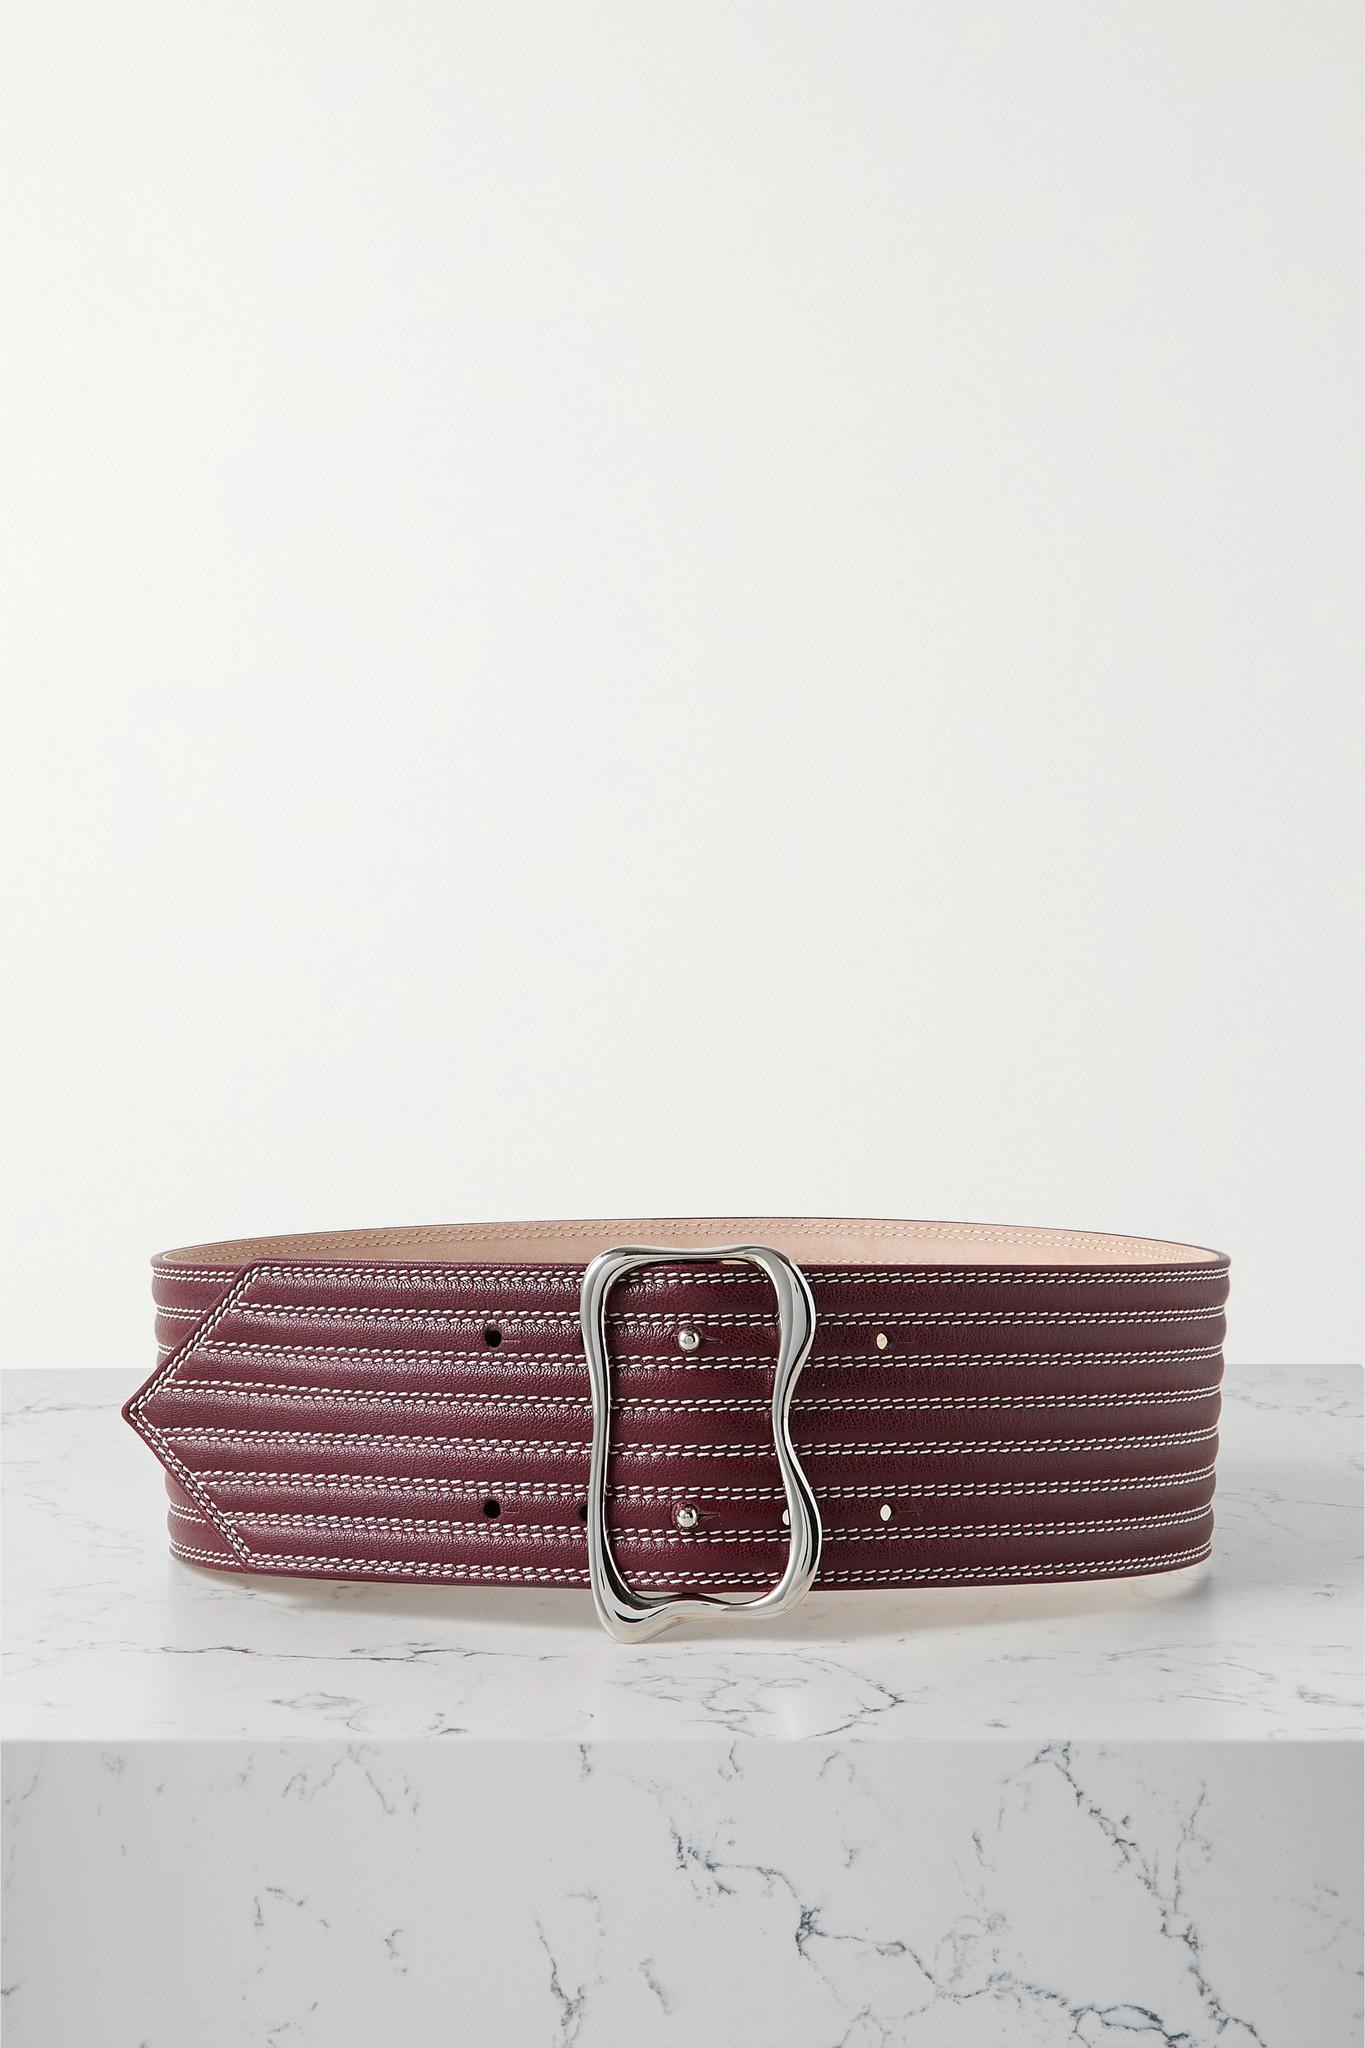 CHLOÉ - Topstitched Leather Waist Belt - Burgundy - L